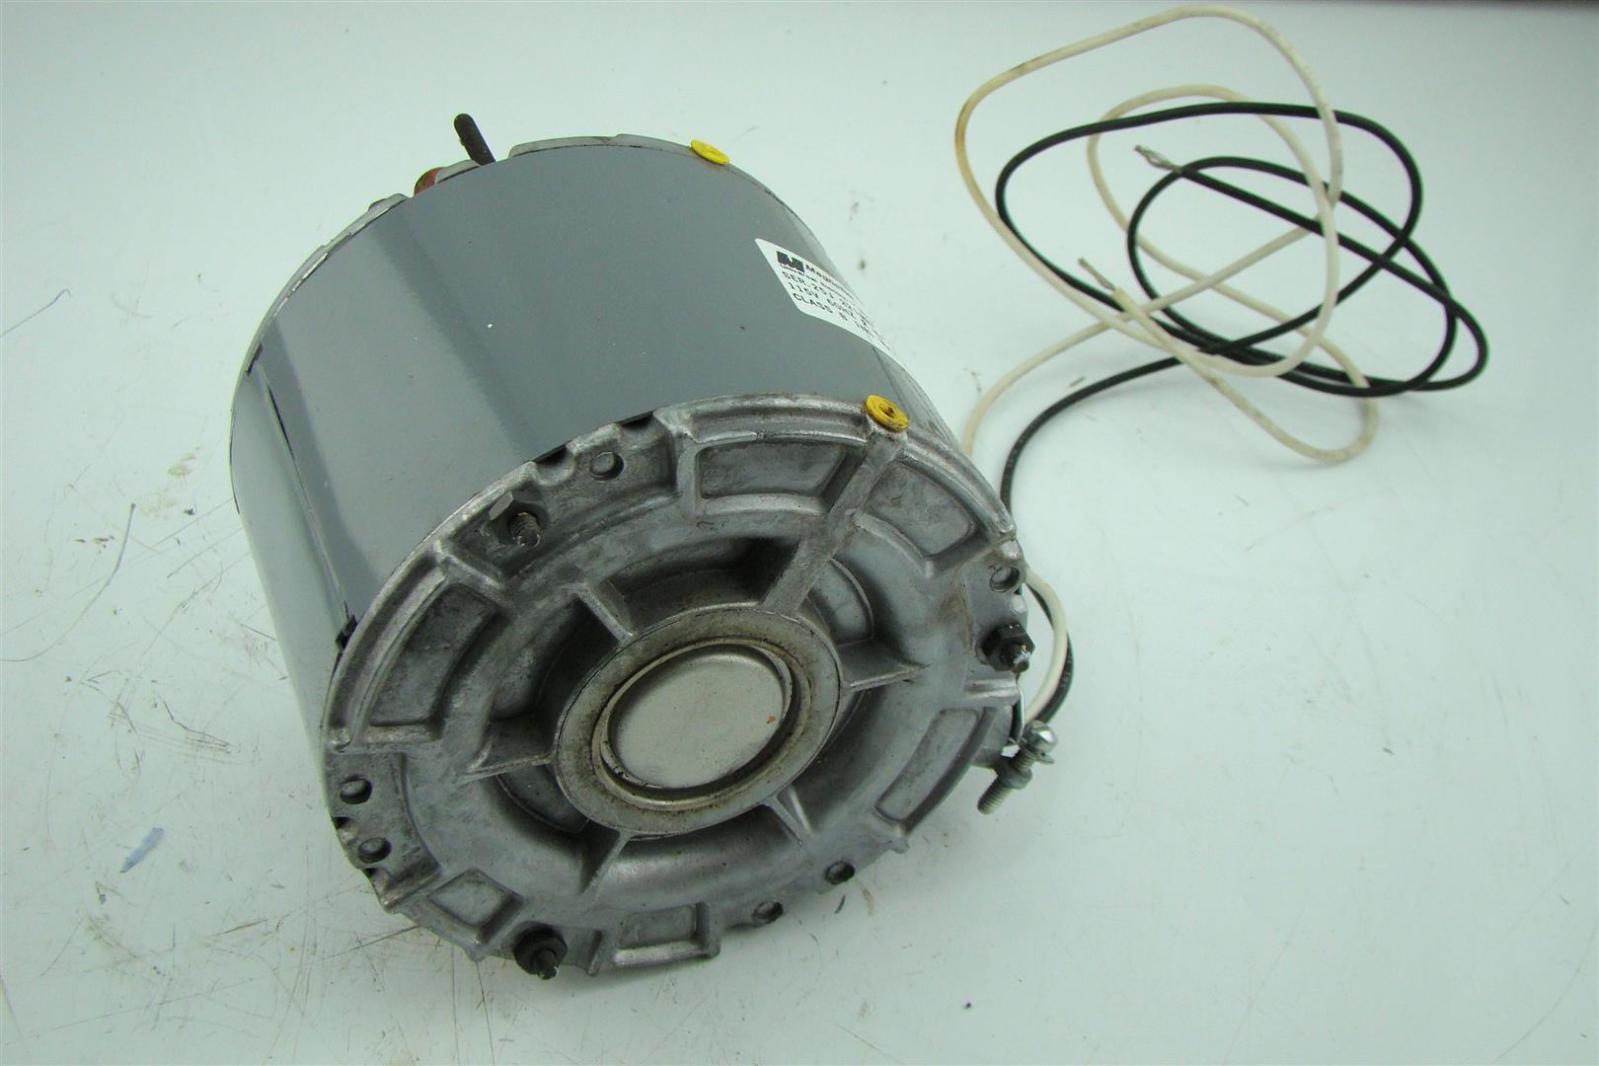 Magnetek Universal Electric Motor 1 15 Hp 2 4a 60hz